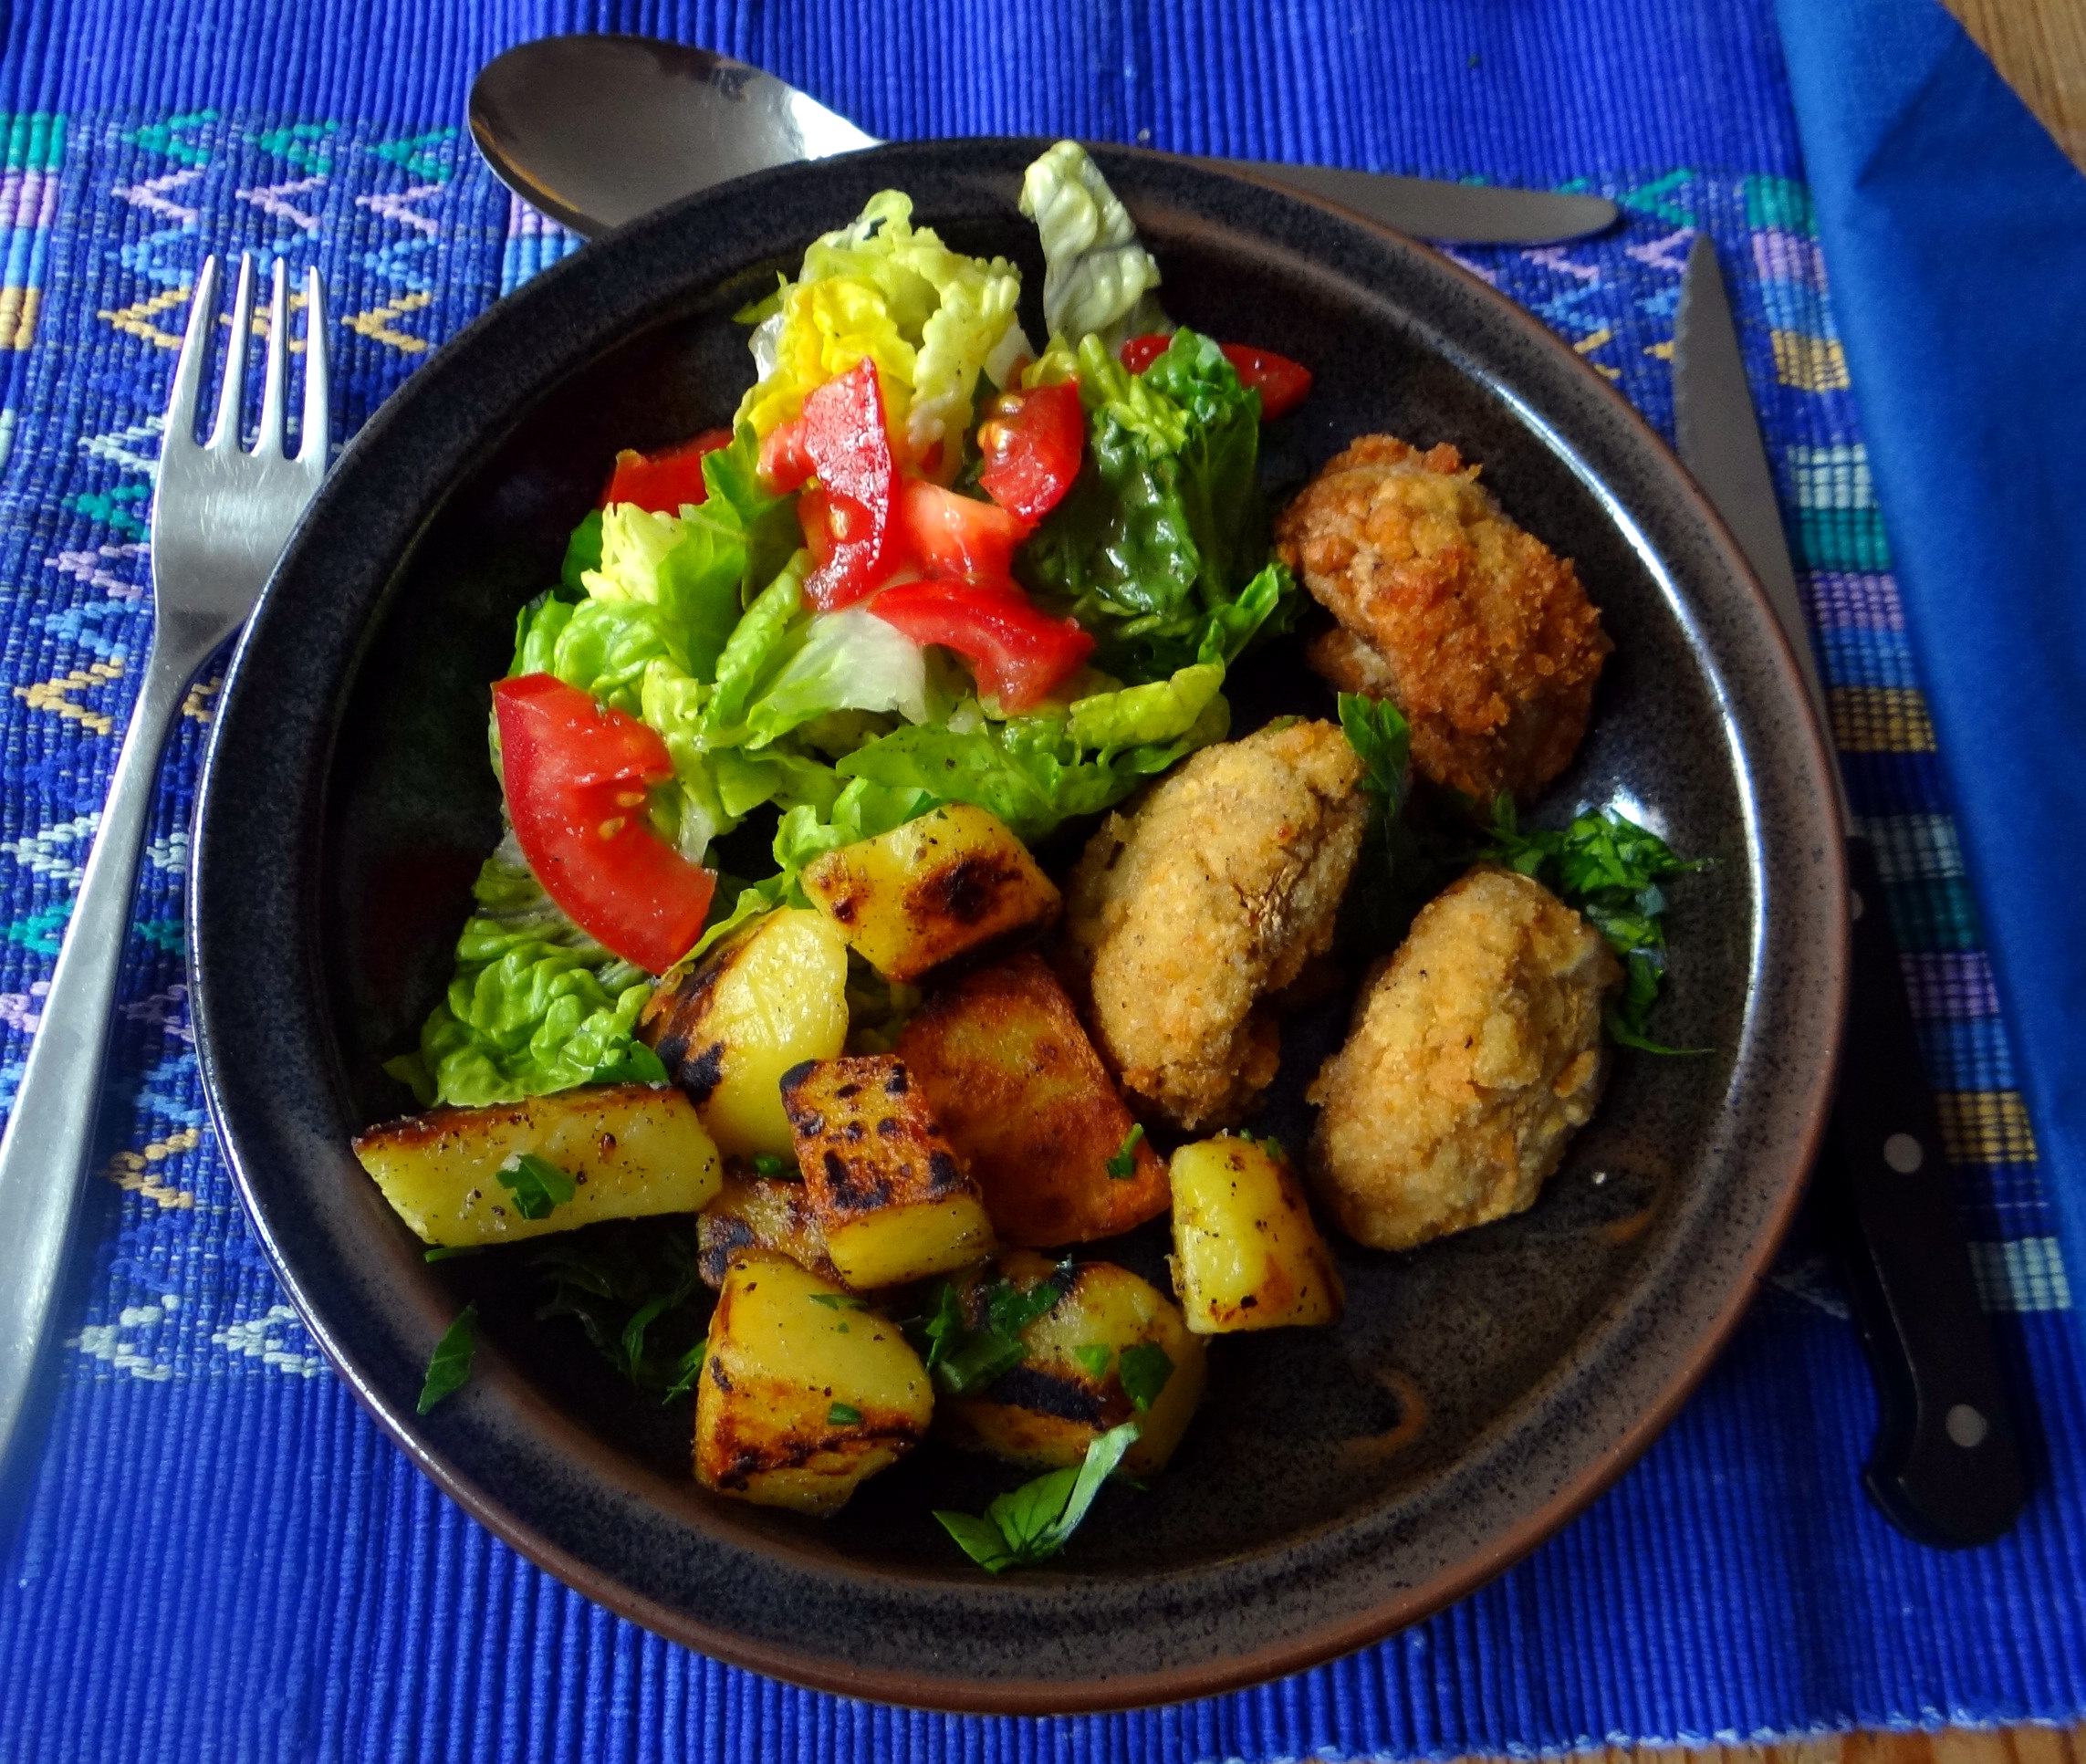 Fritierte Portobello,Bratkartoffeln,Pimientos,Salat,vegan (18)